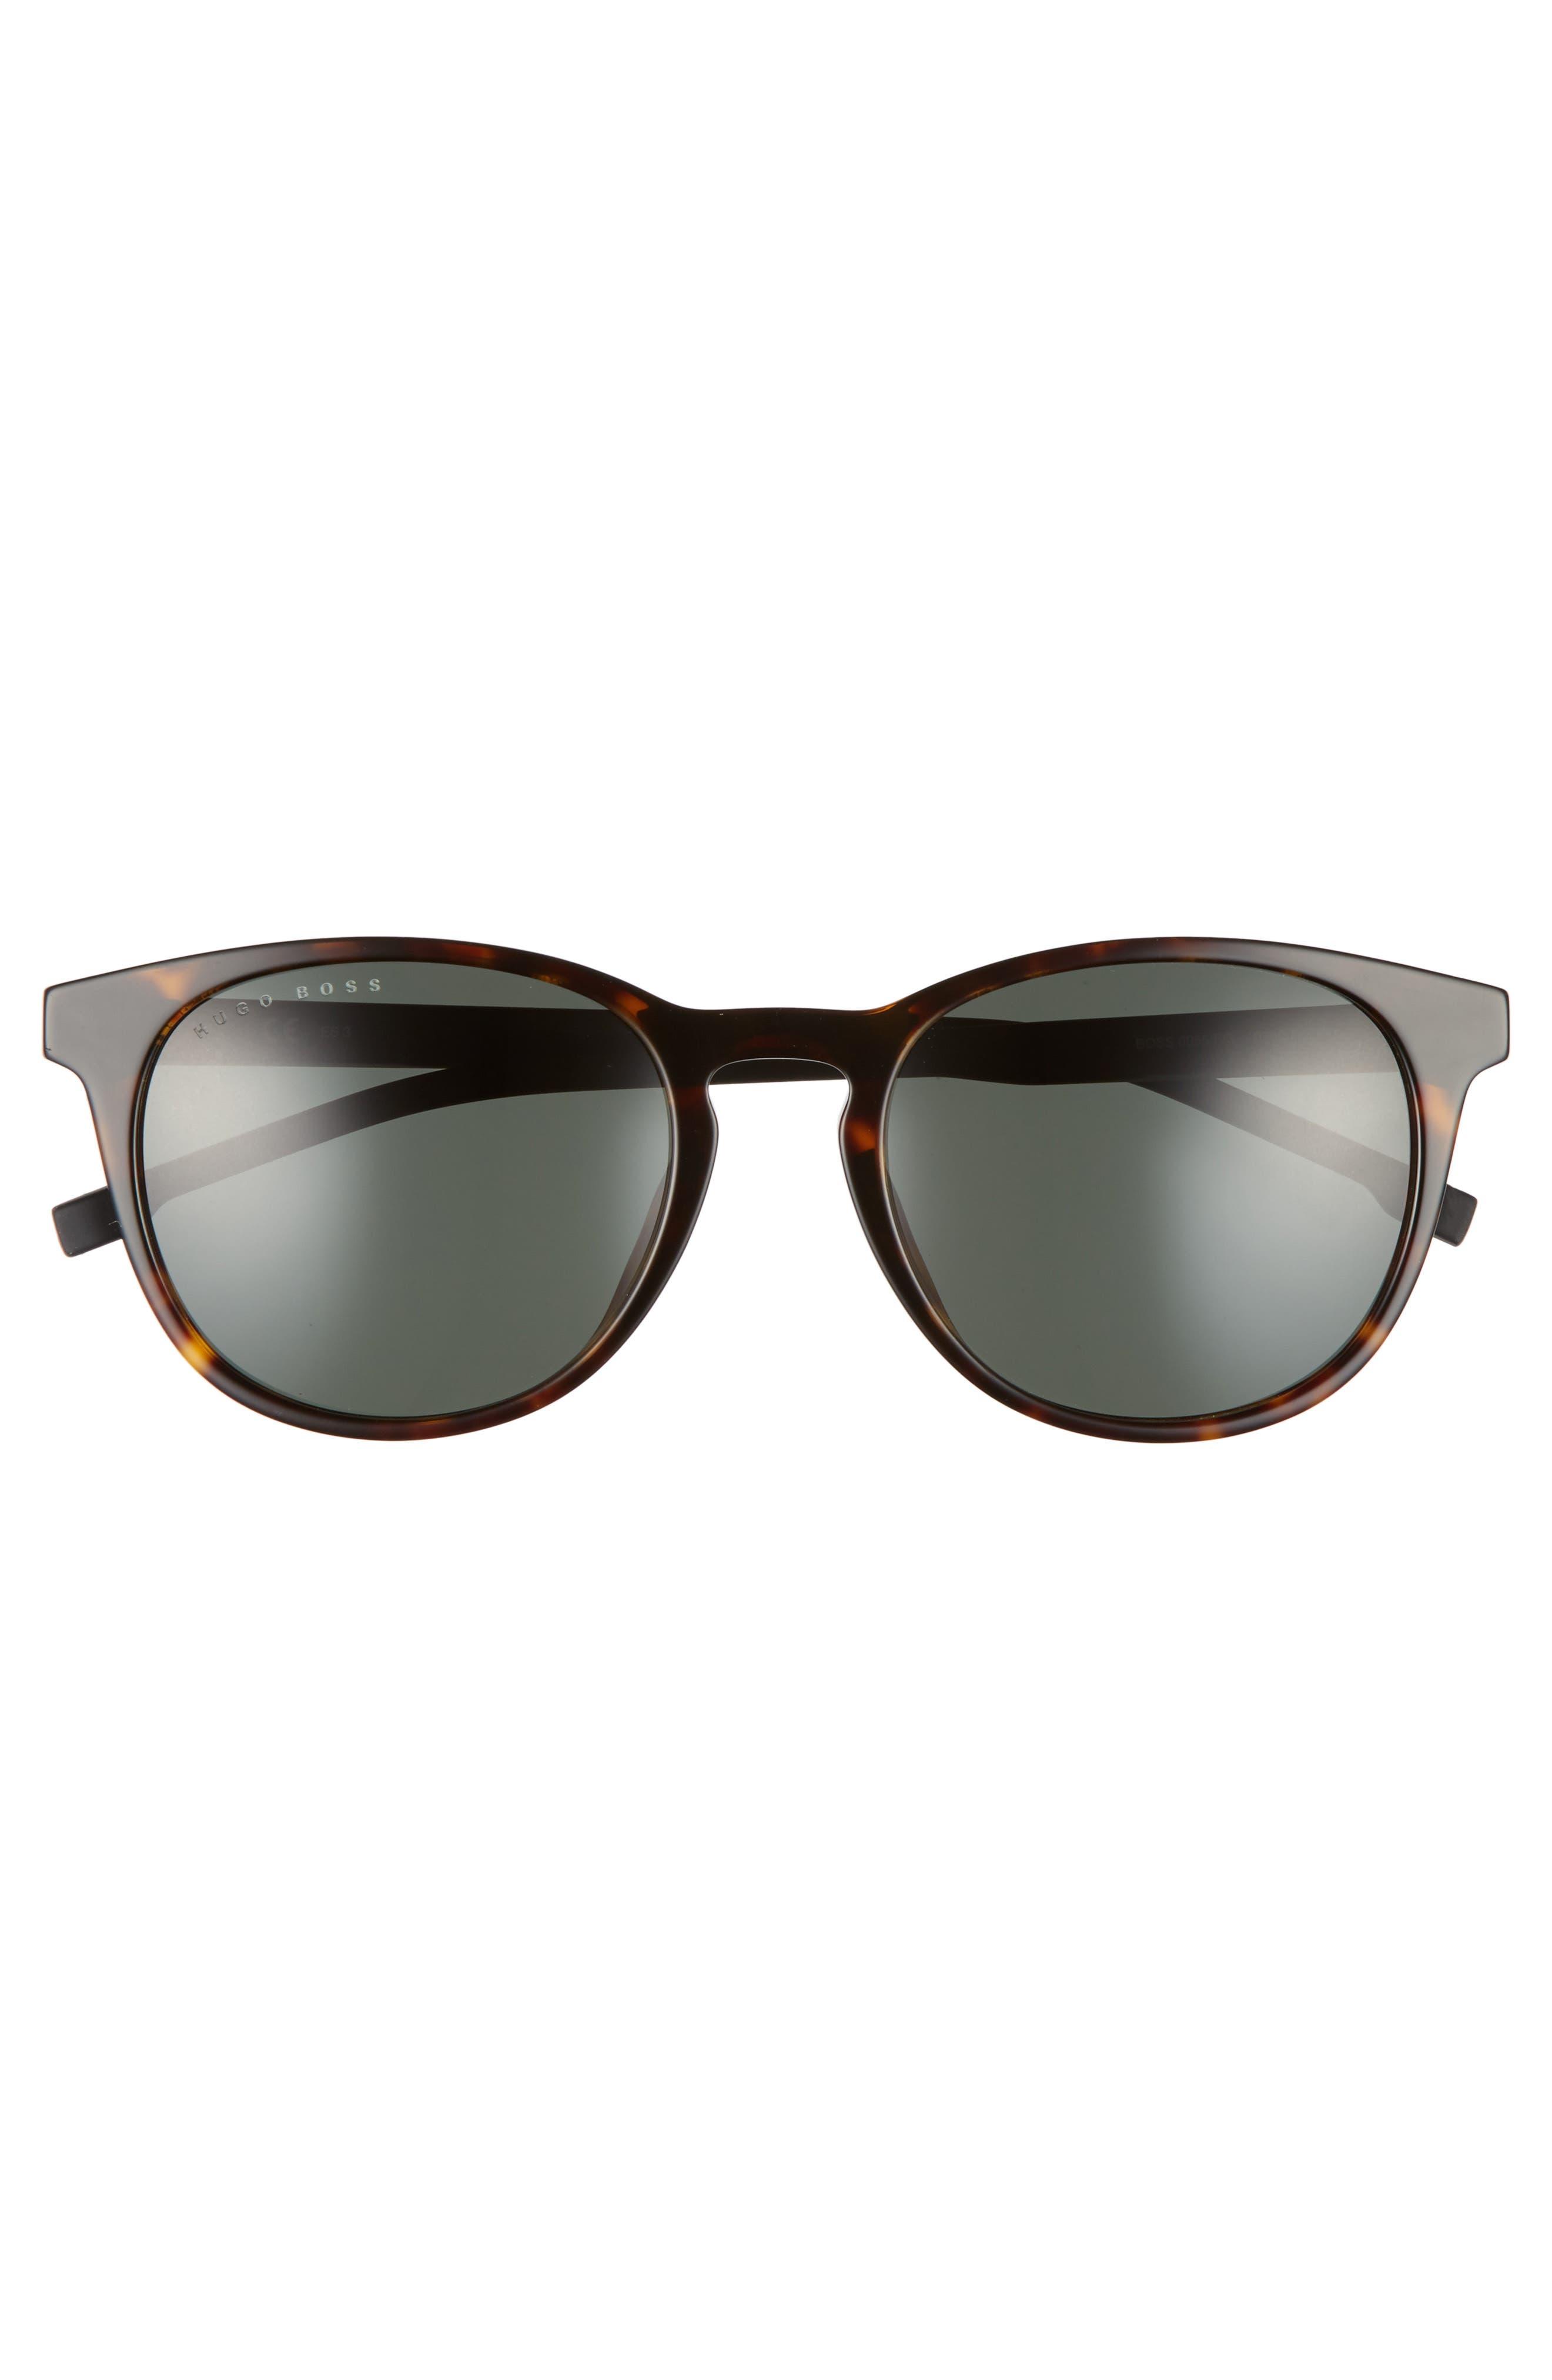 54mm Sunglasses,                             Alternate thumbnail 2, color,                             DARK HAVANA/ GREEN